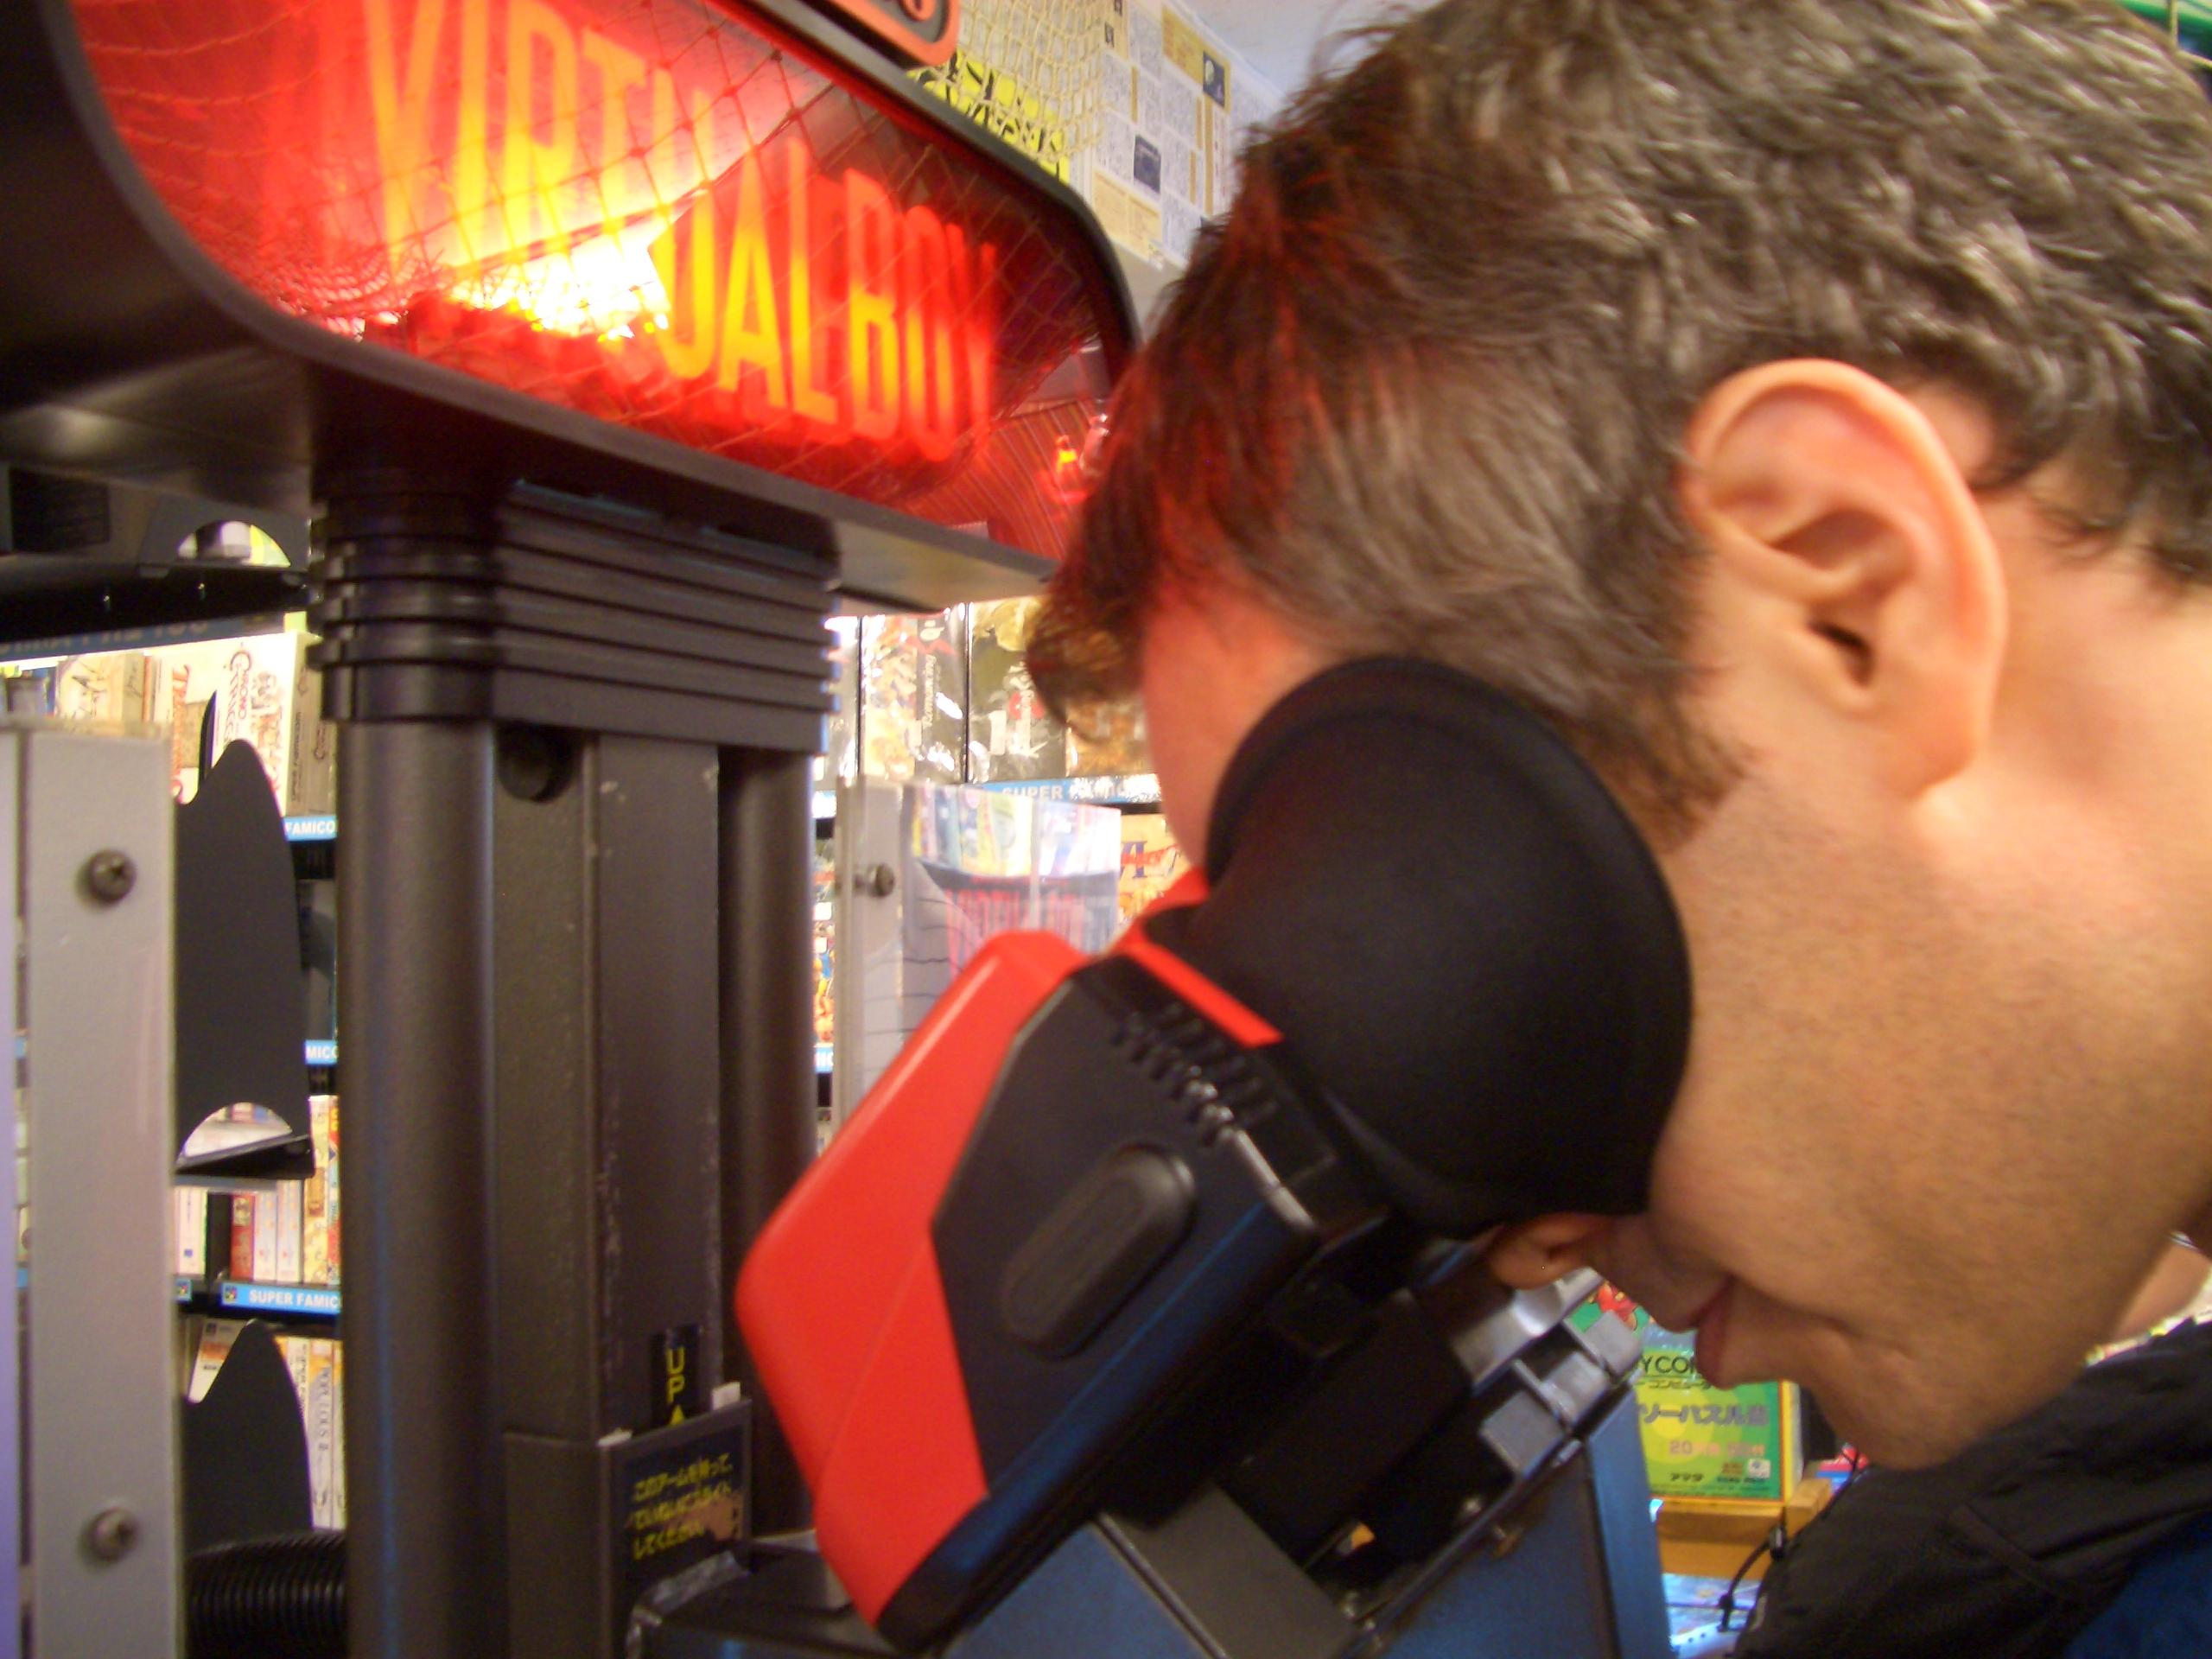 Virtual Boy demo kiosk in Akihabara, Tokyo